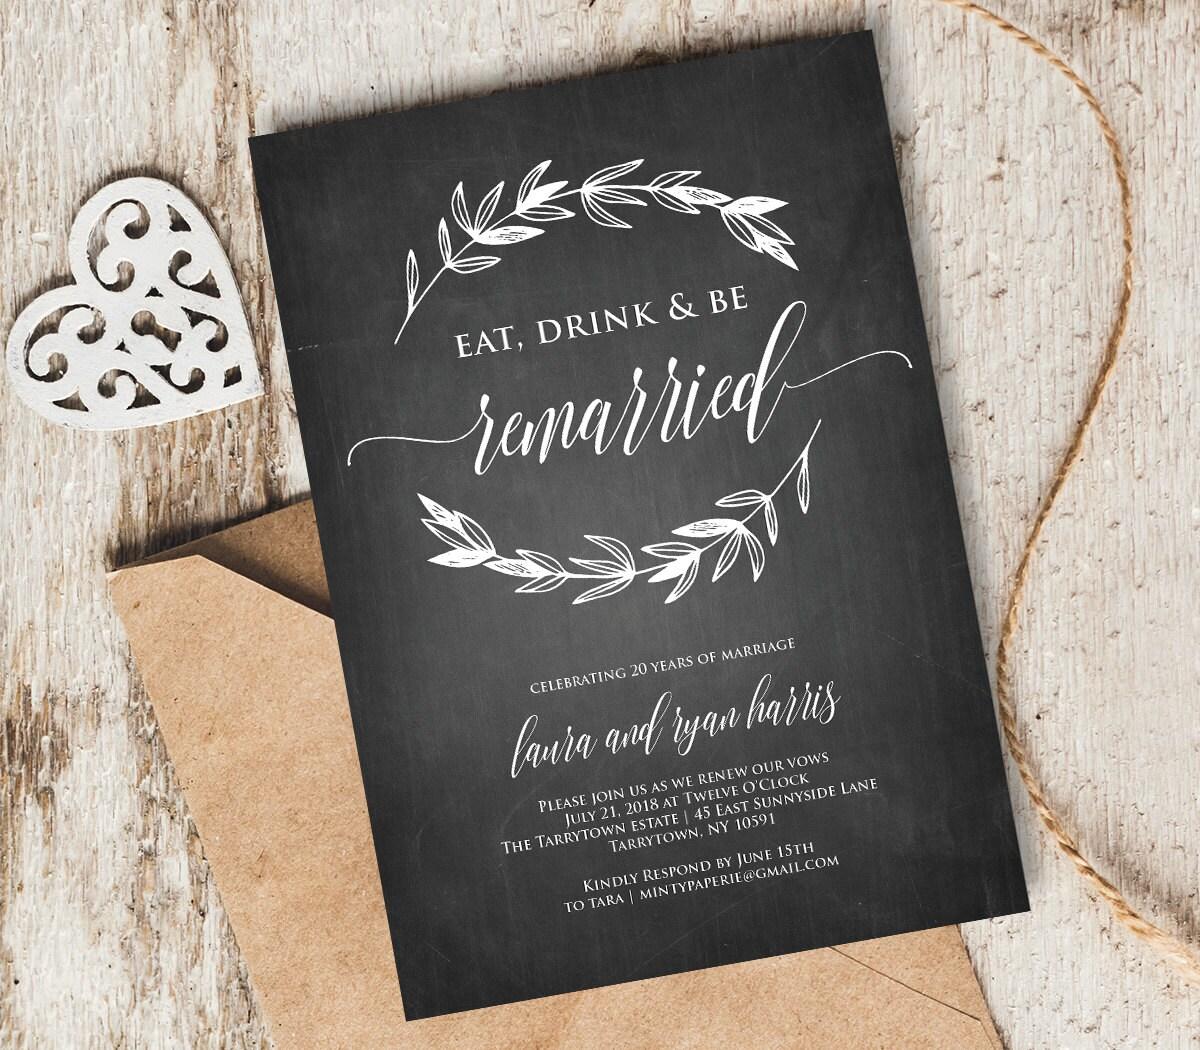 Officemax Wedding Invitations alesiinfo